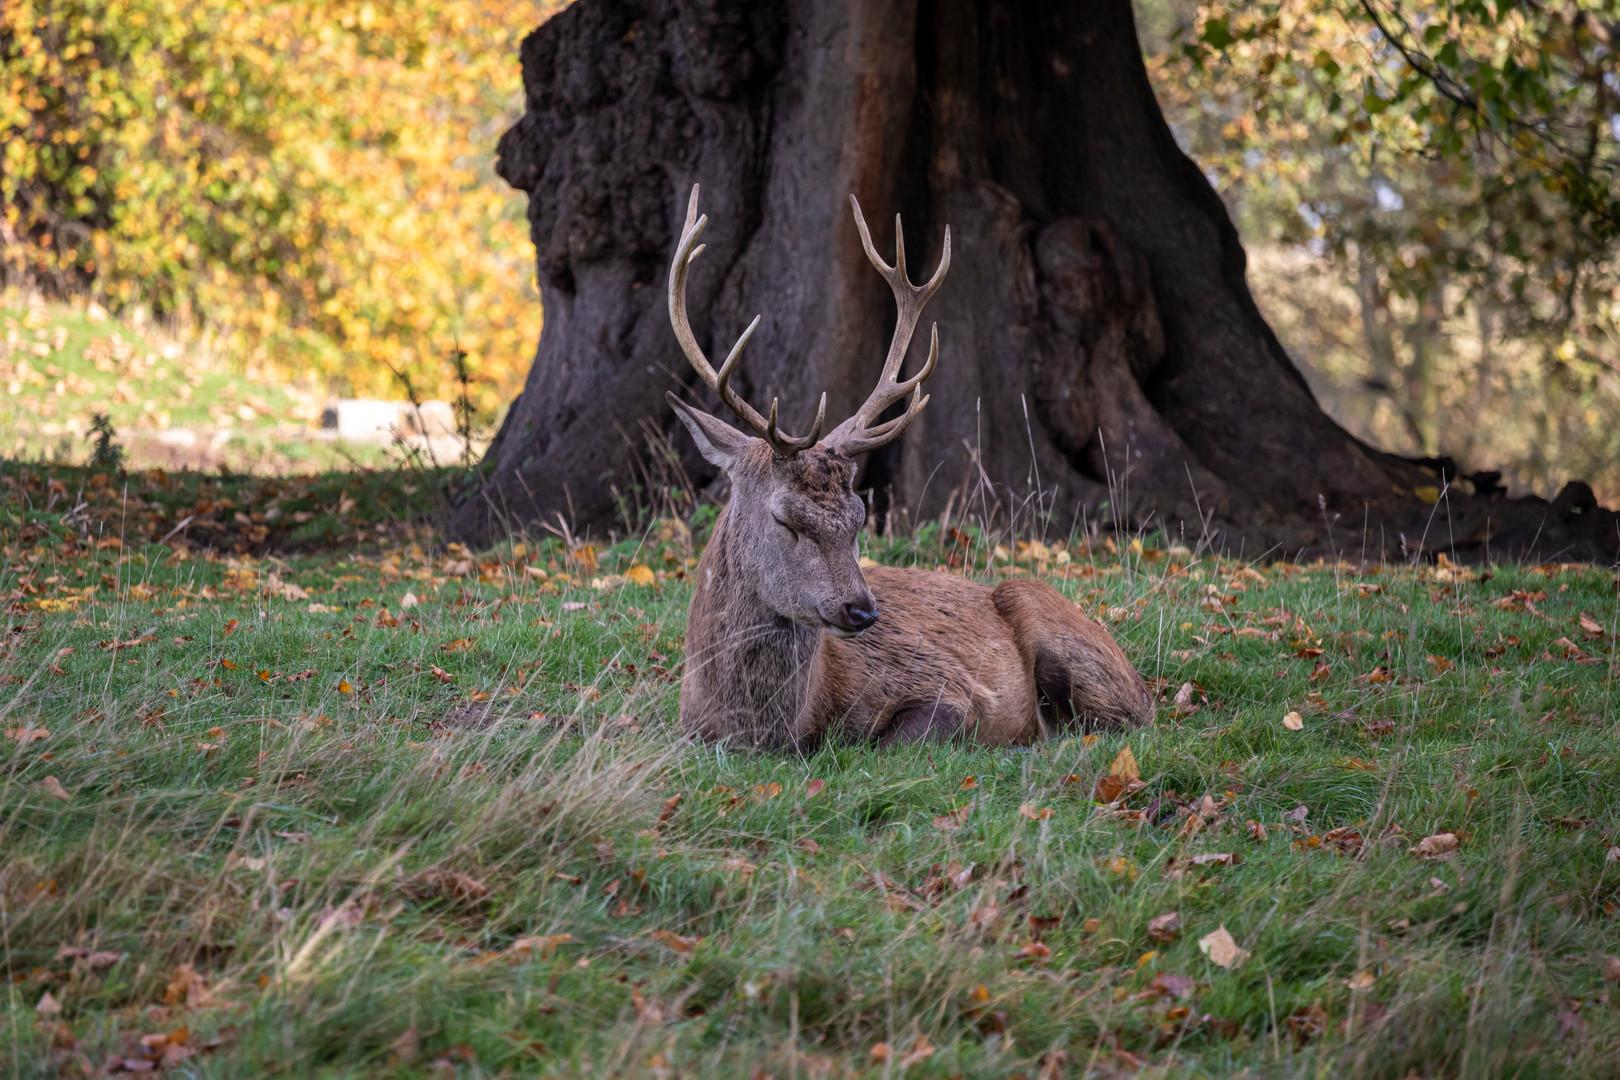 Red Deer at Studley Royal Deer Park, Ripon, North Yorkshire